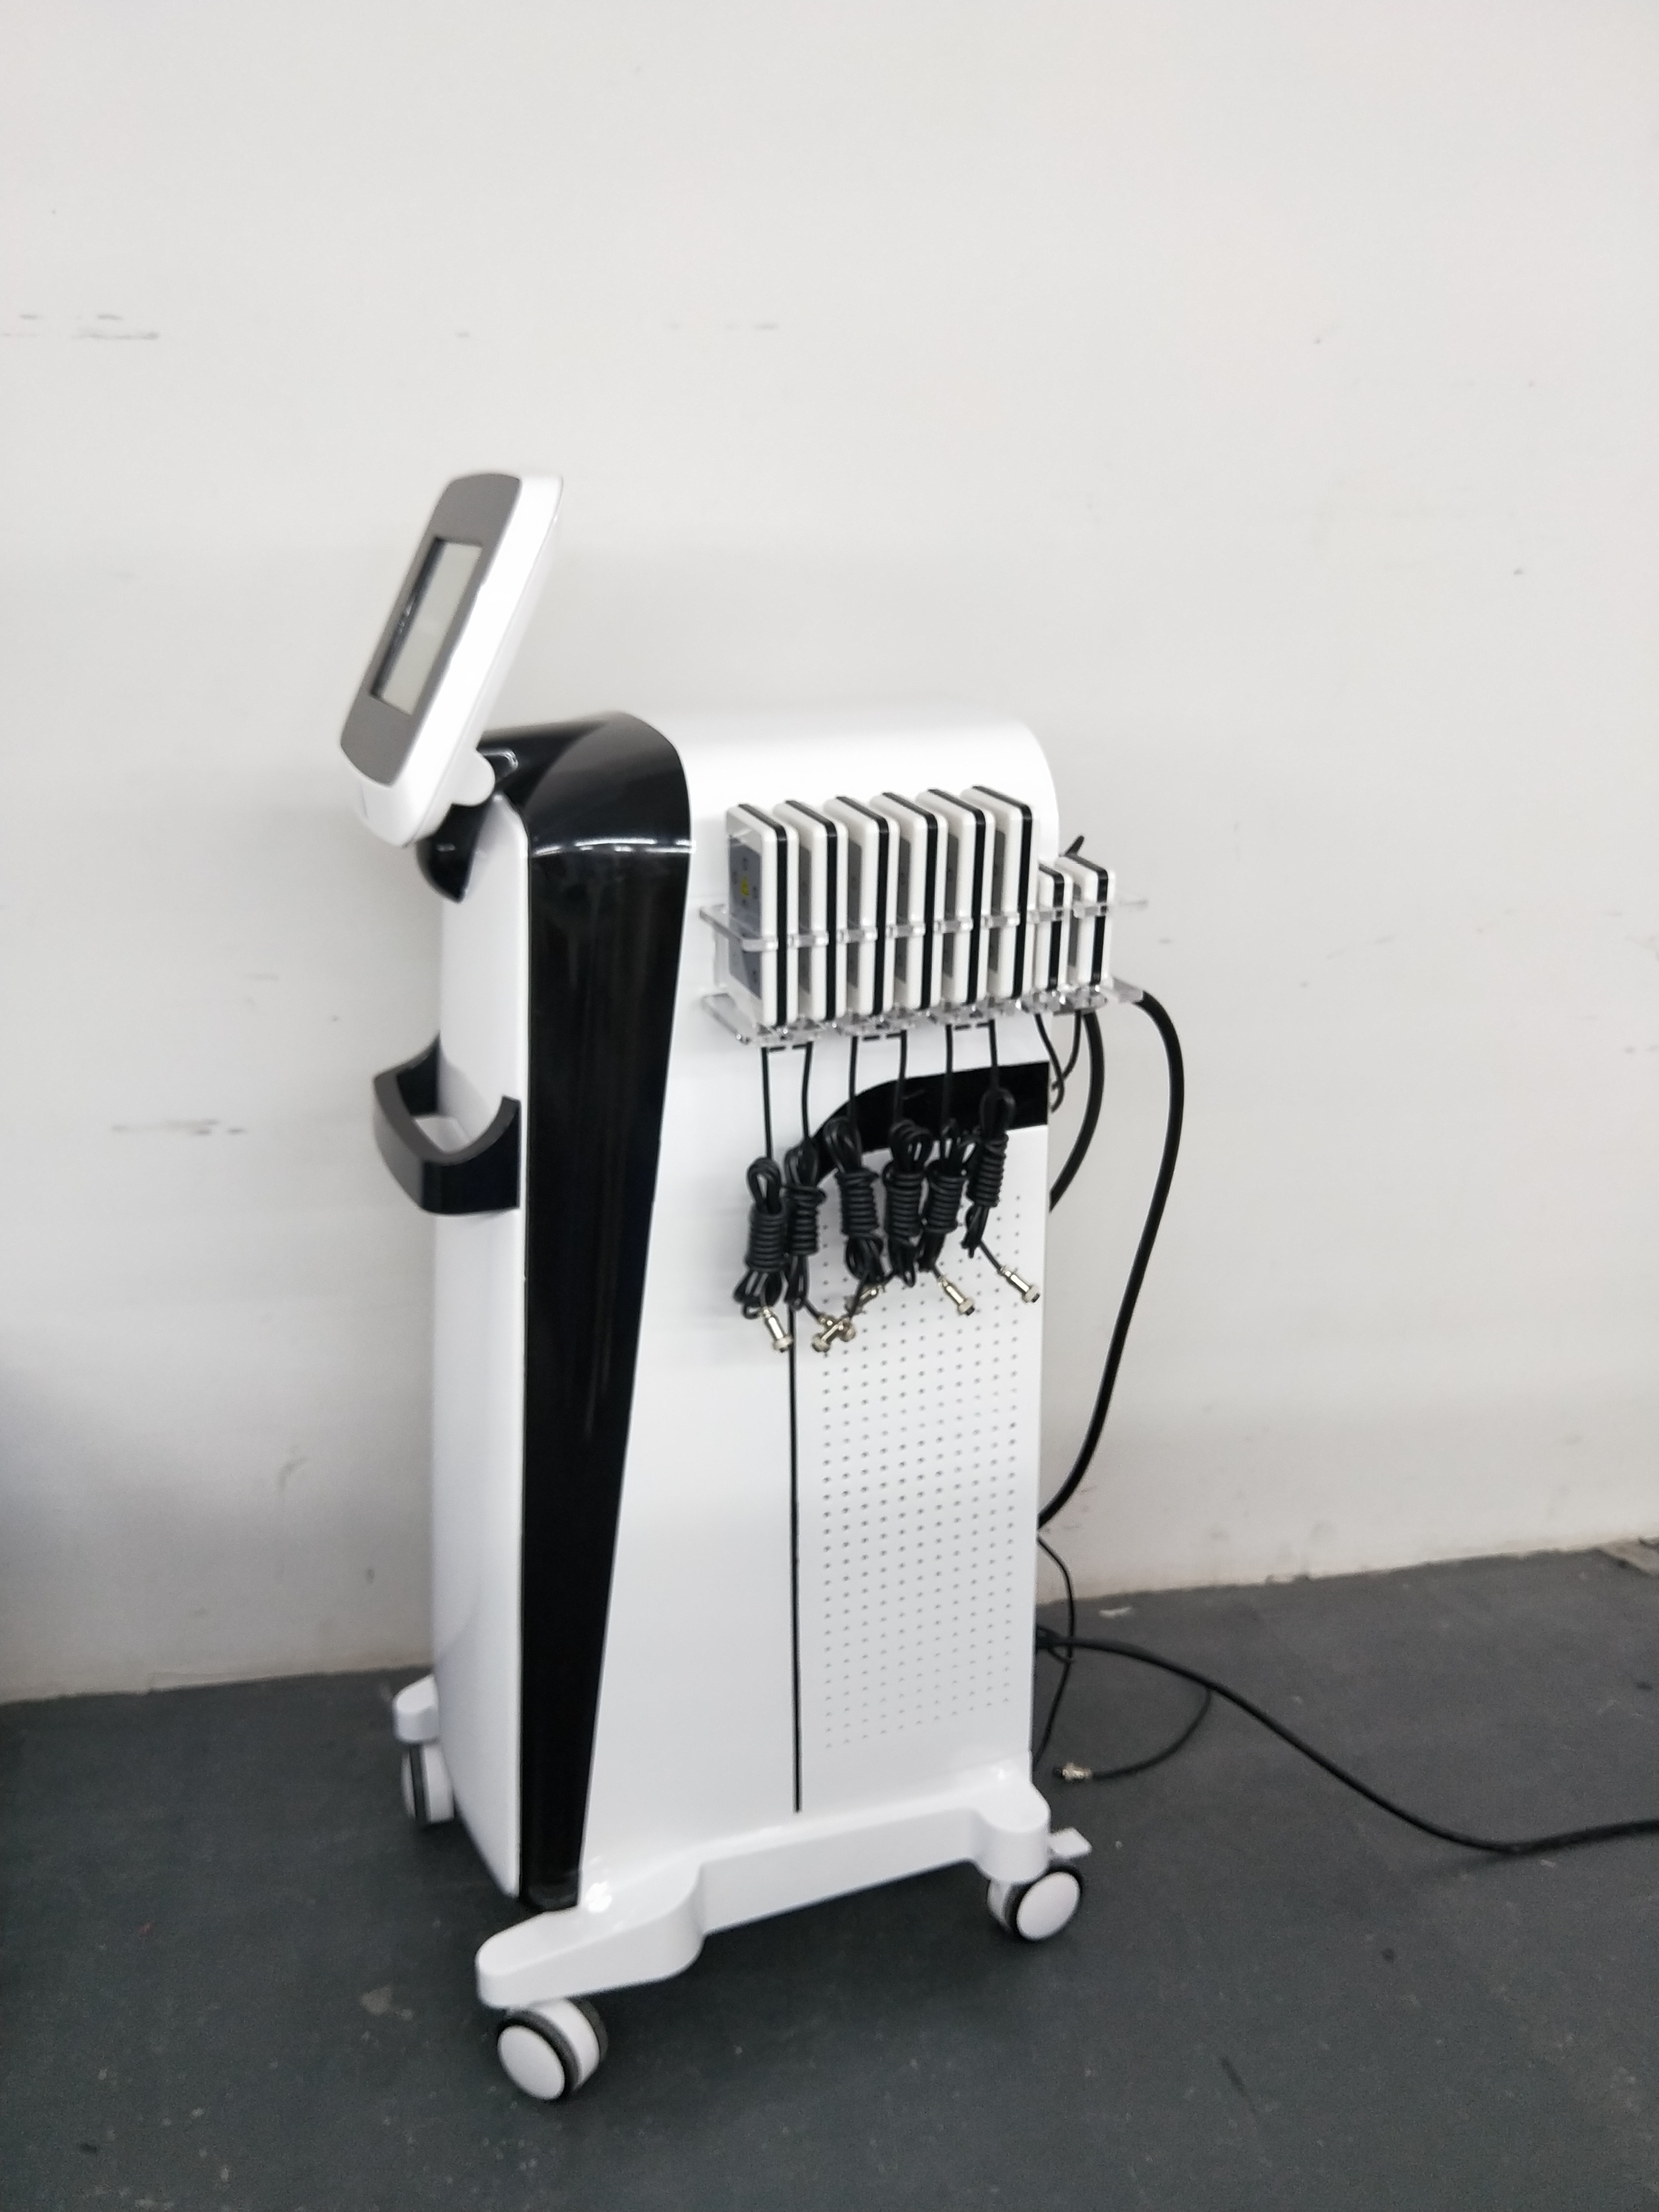 Factory Laser Cavitation Fat System LS650 Weight Loss Machine RF Skin Rejuvenation